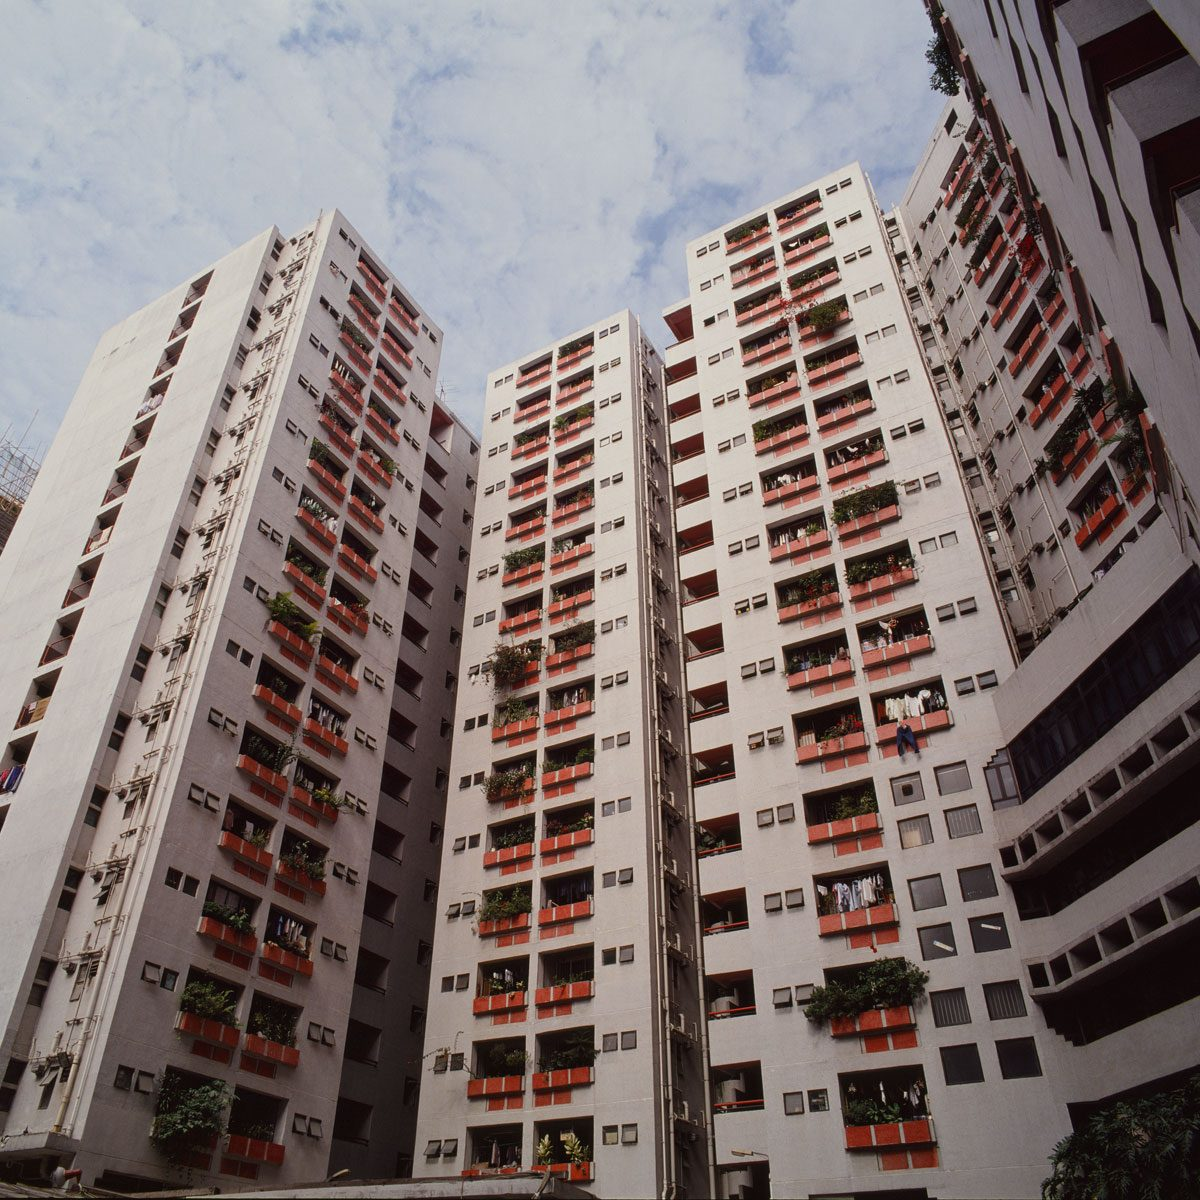 Ka Wai Chuen at 44-48 Ma Tau Wai Road, Kowloon